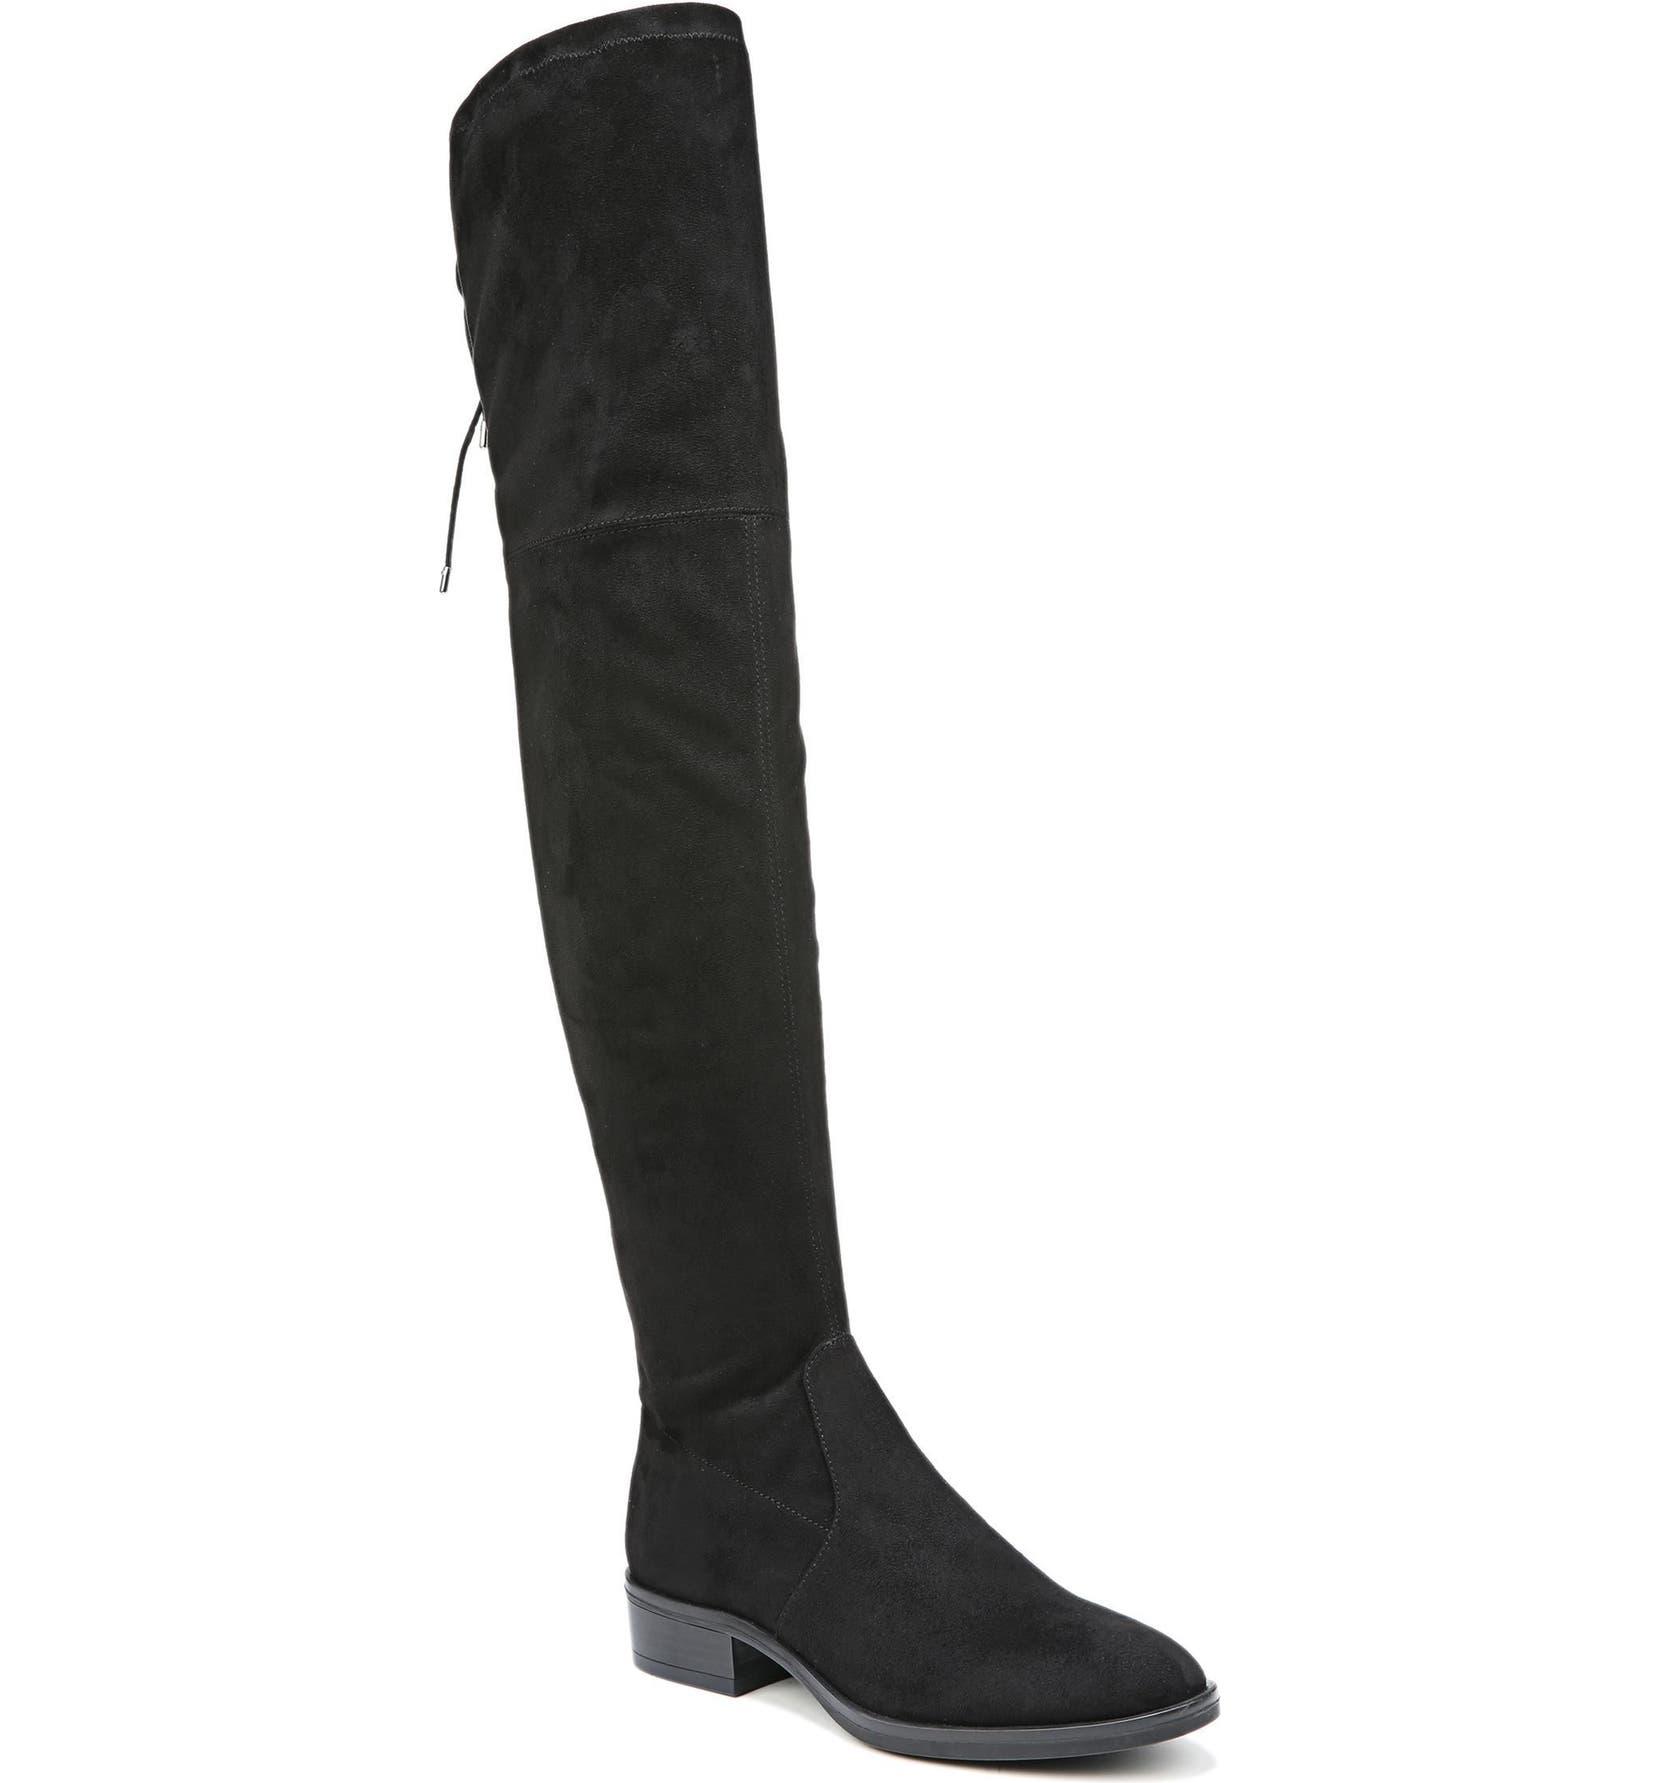 0fb1b5f781d9 Sam Edelman Paloma Over the Knee Boot (Women) | Nordstrom